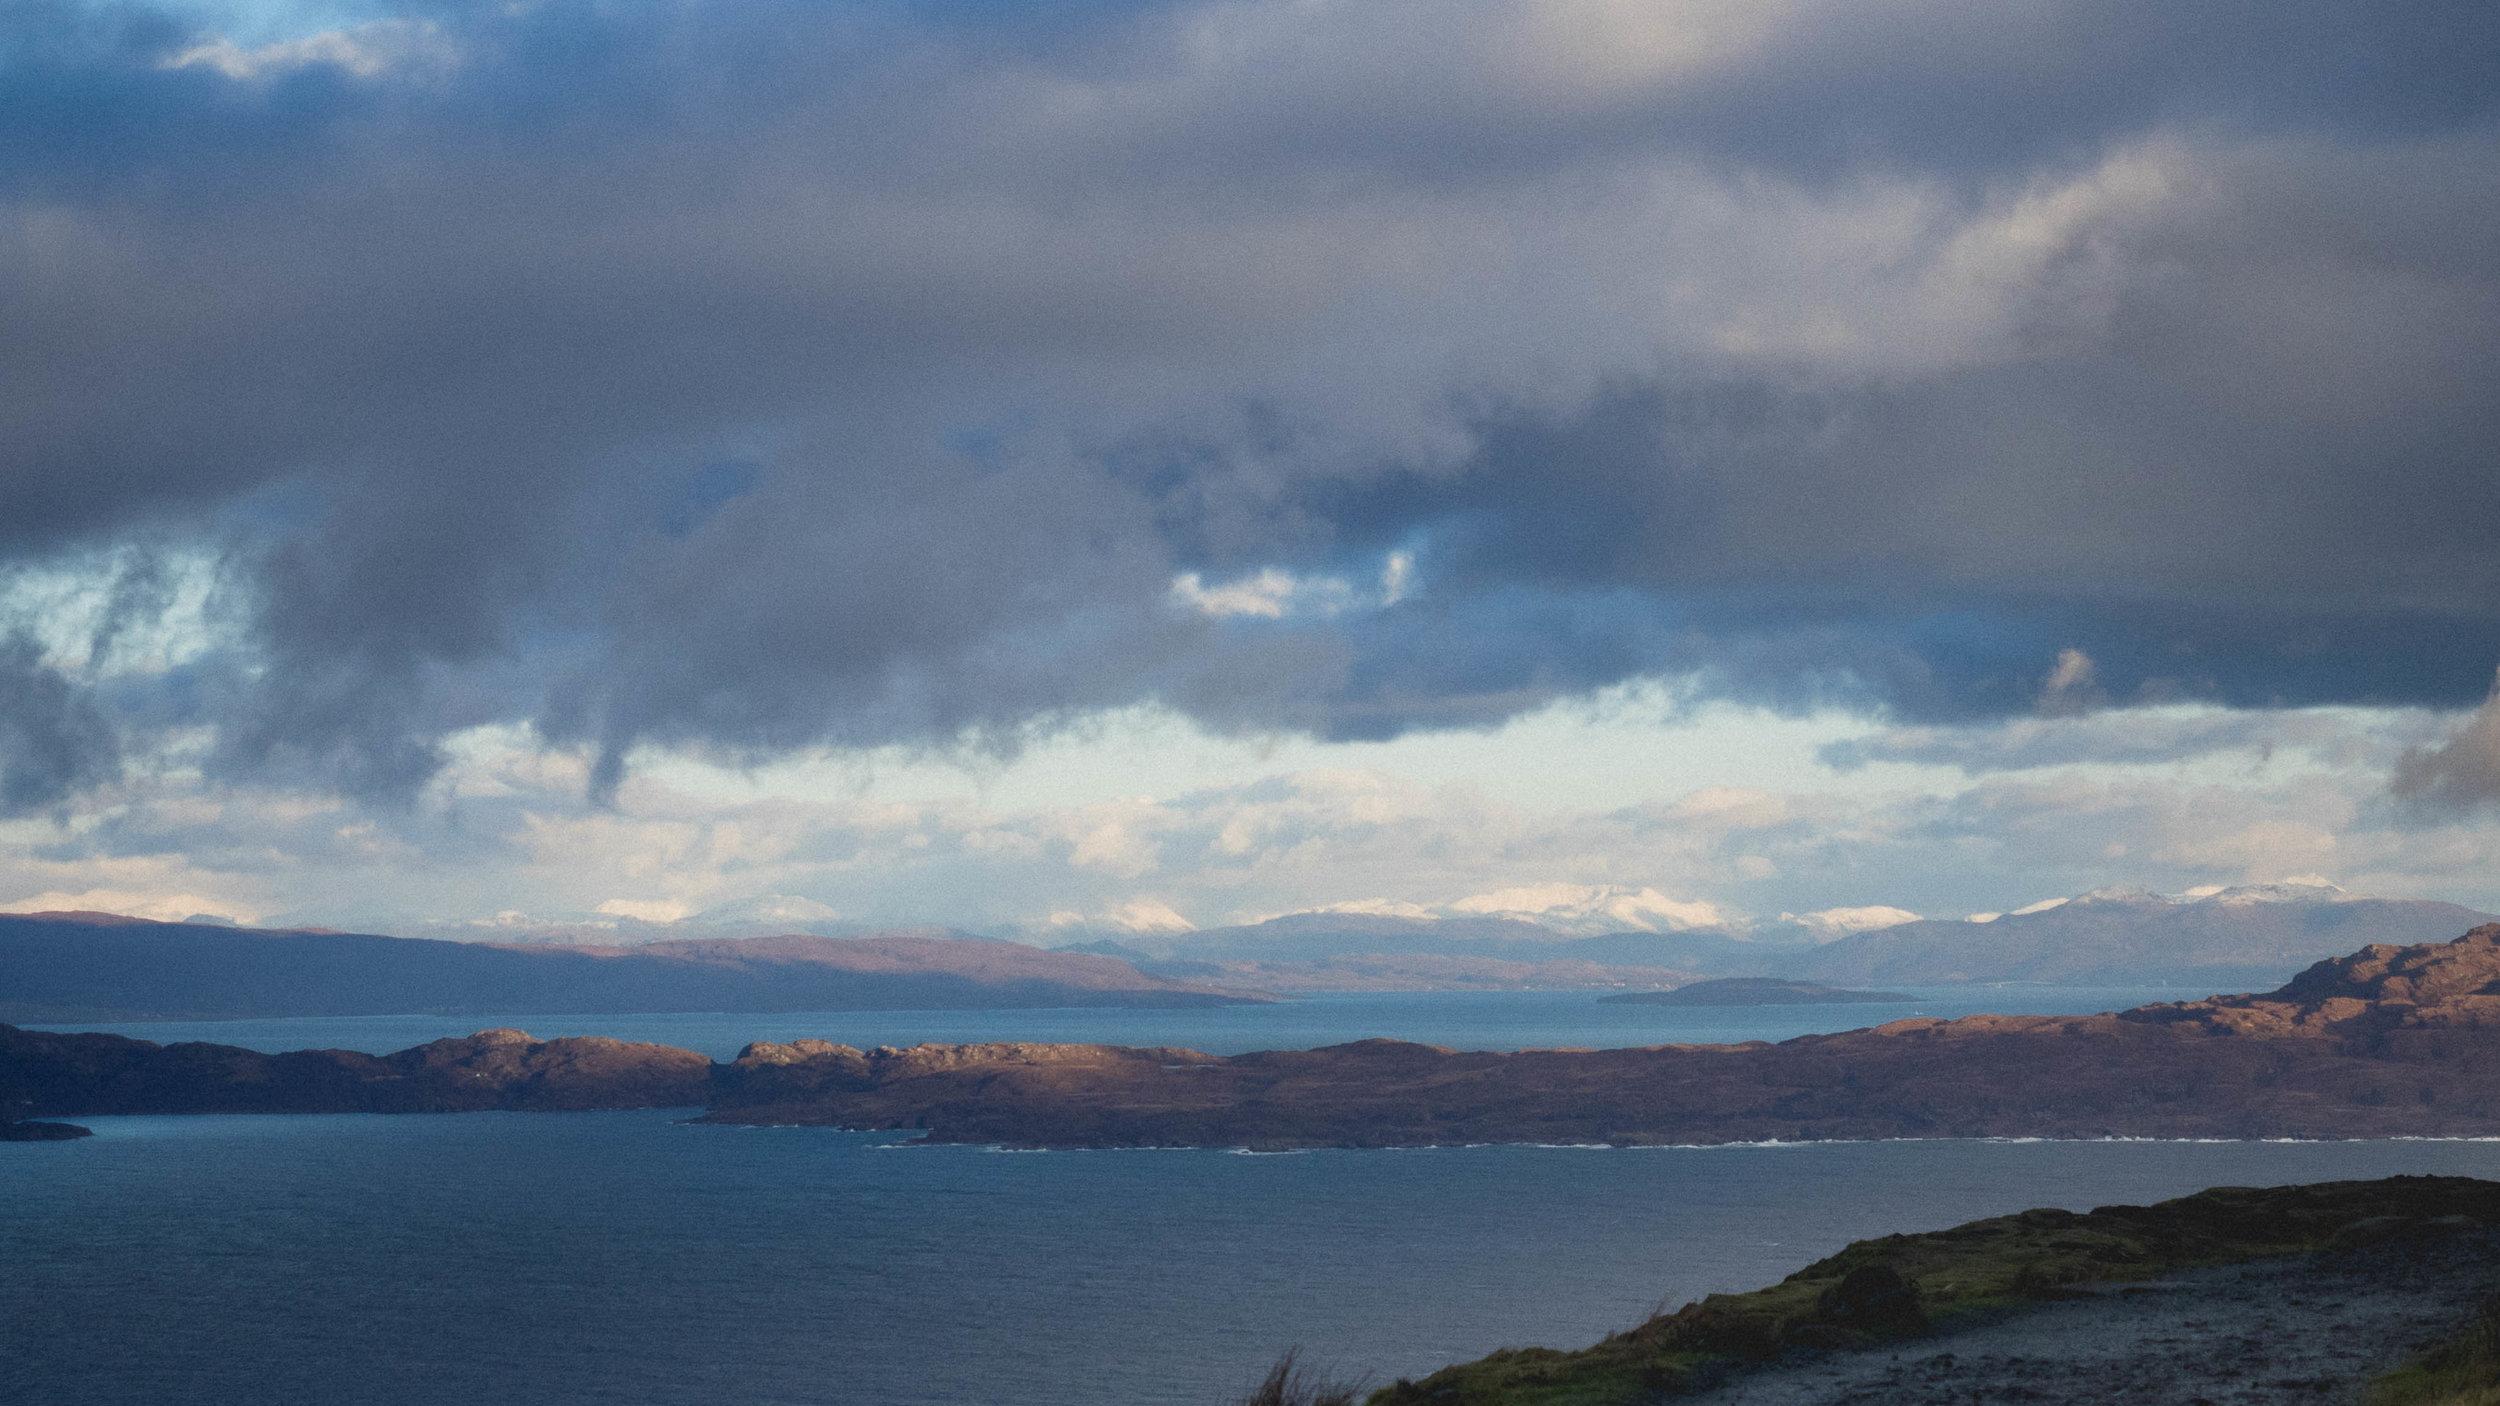 isle-of-skye-snapshots-125.jpg